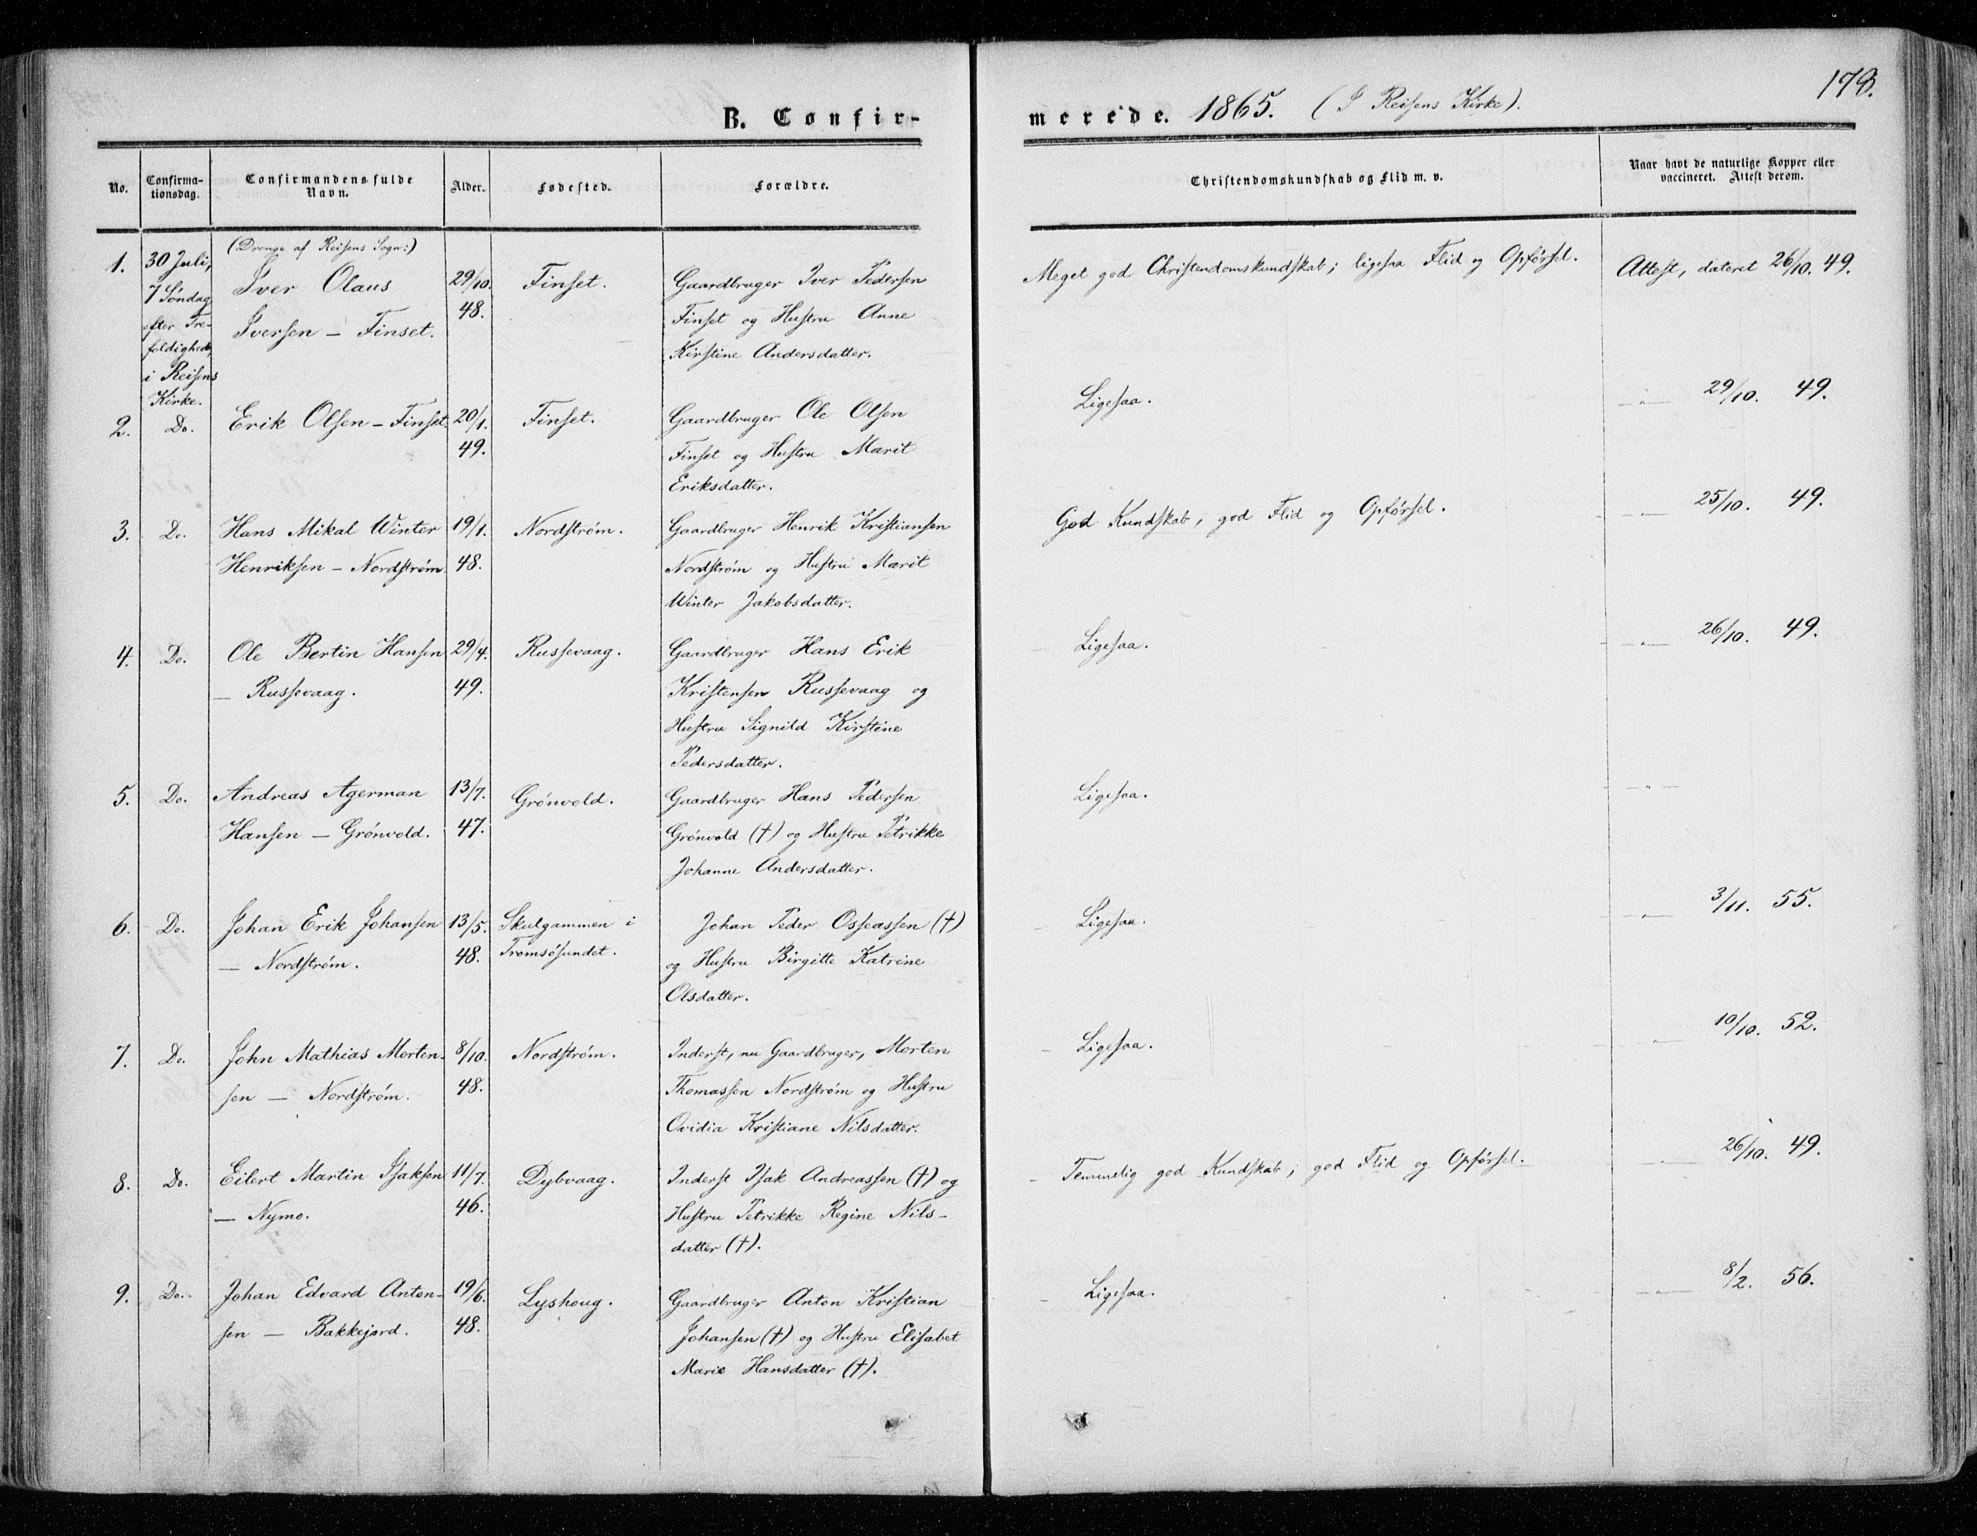 SATØ, Tranøy sokneprestkontor, I/Ia/Iaa/L0007kirke: Ministerialbok nr. 7, 1856-1866, s. 178